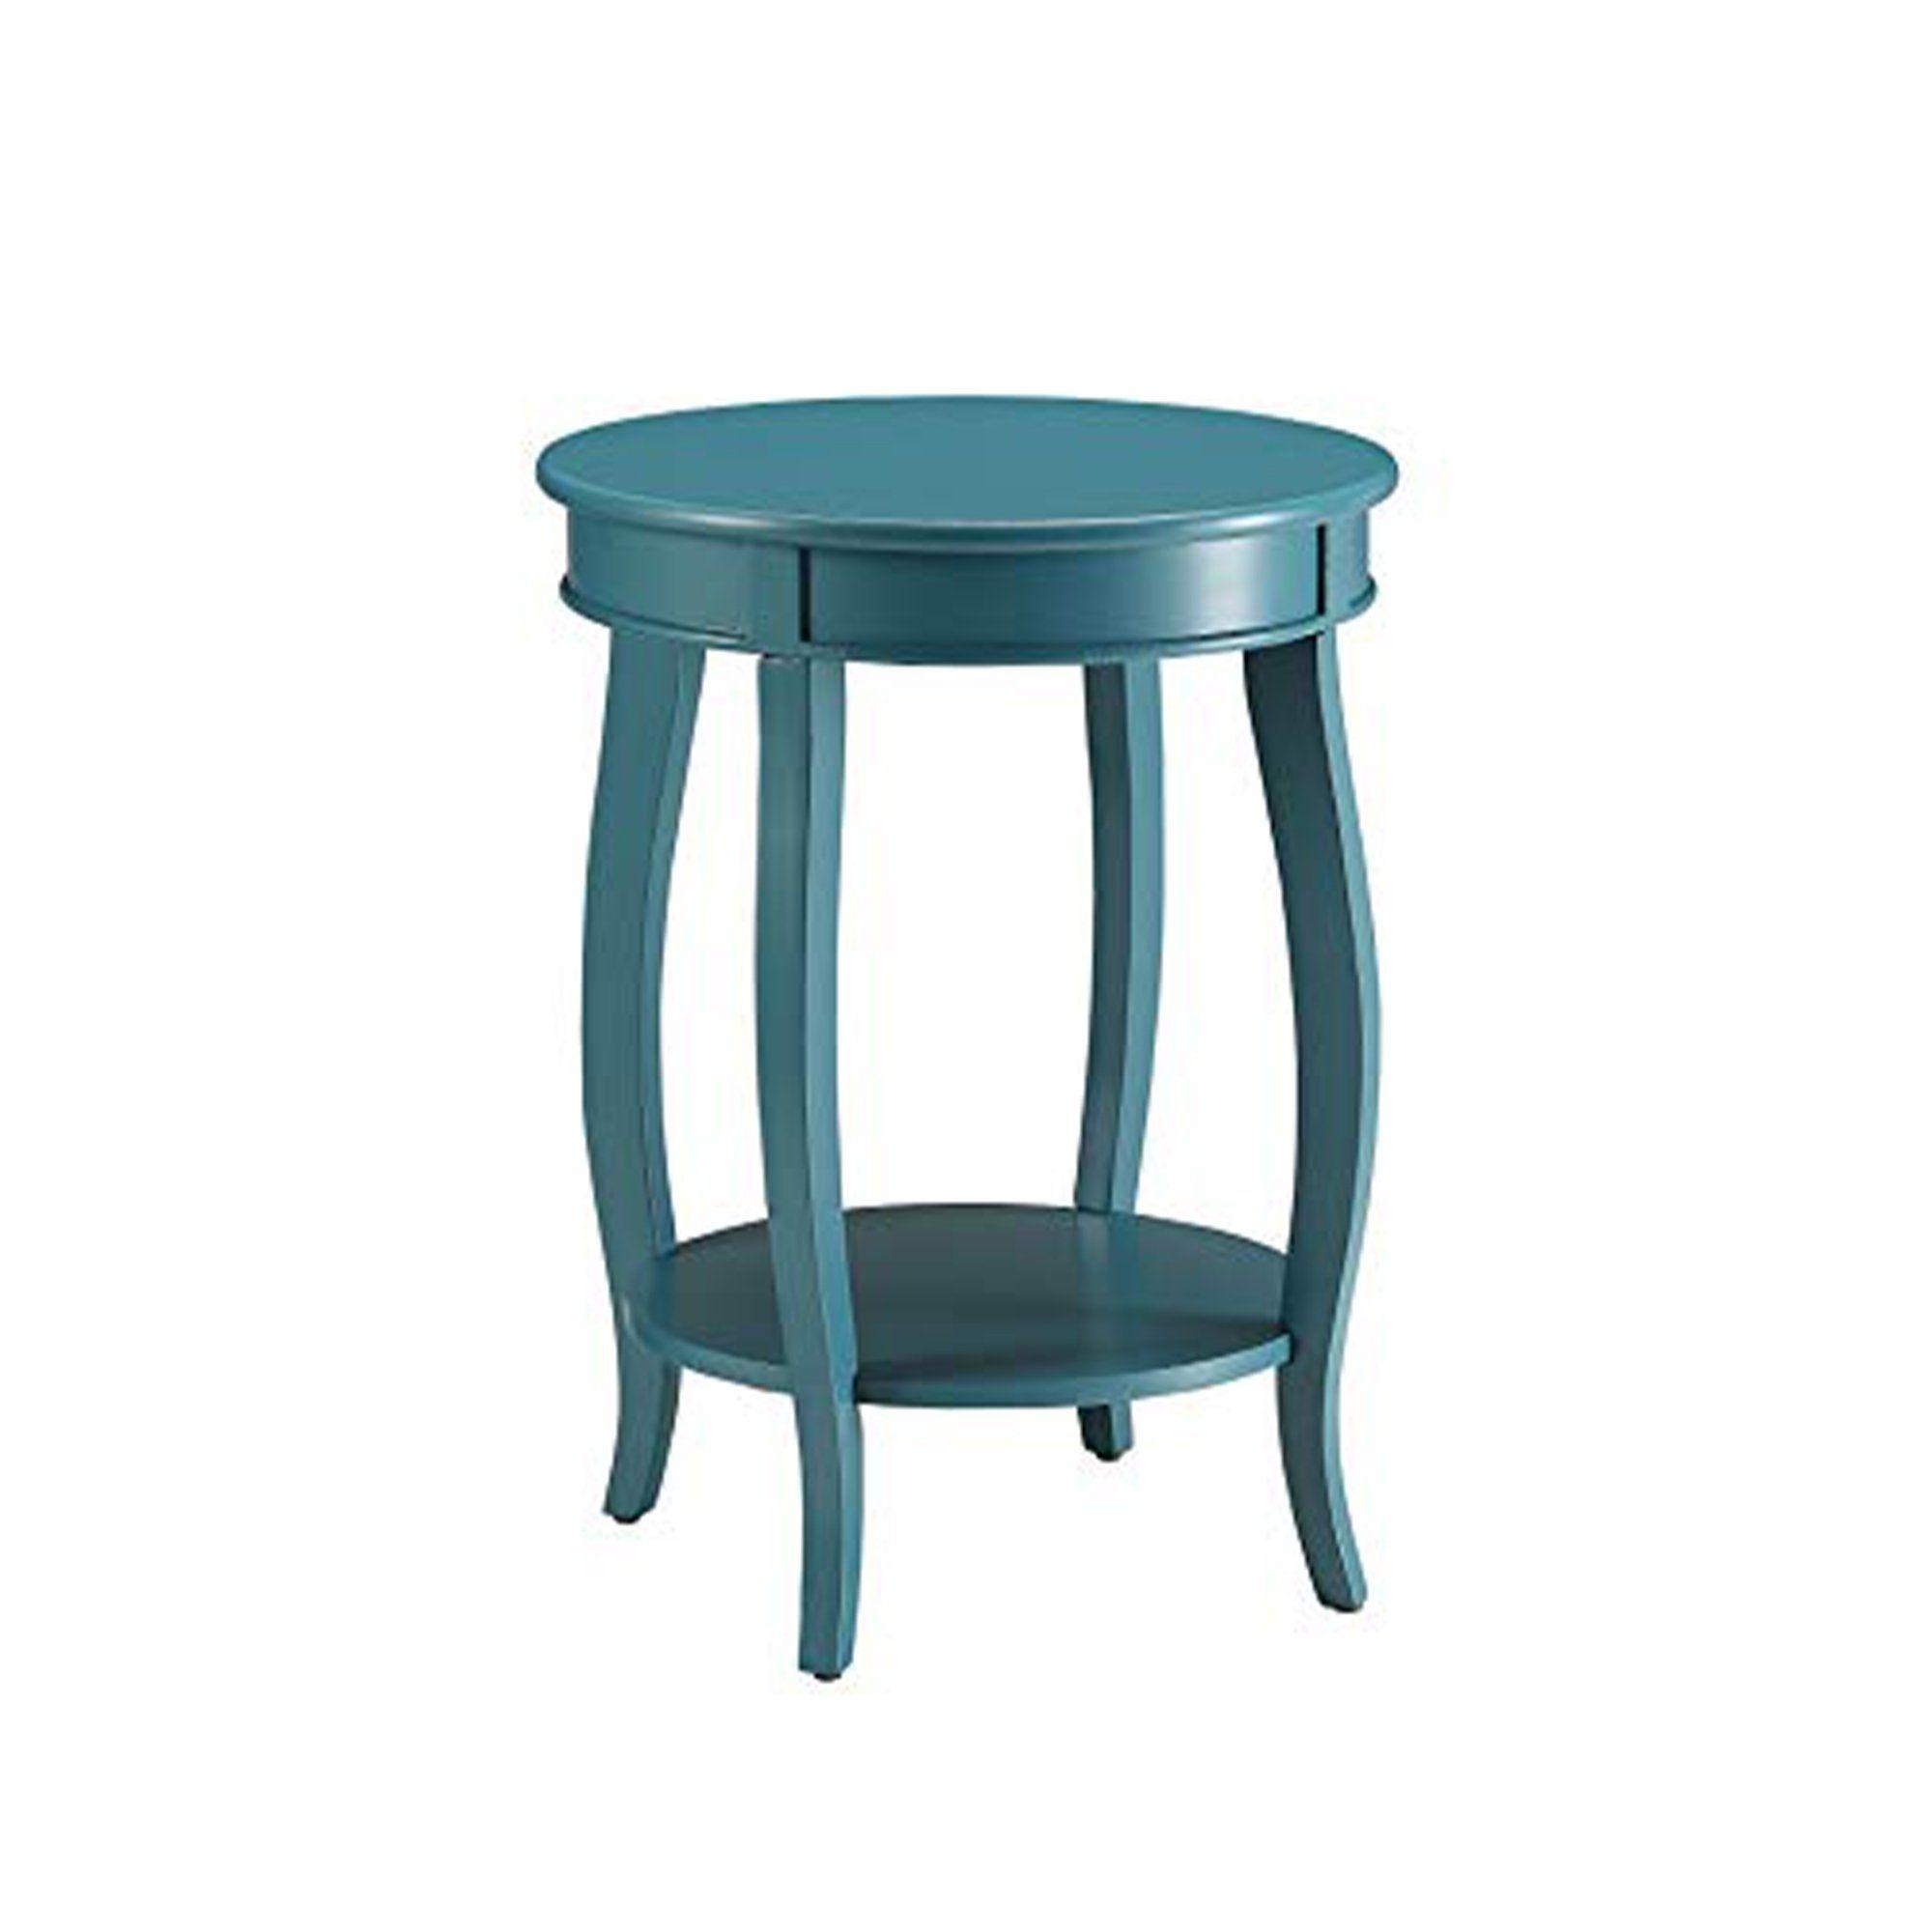 Affiable Side Table Teal Blue Teal Blue Mdf Solid Wood Leg